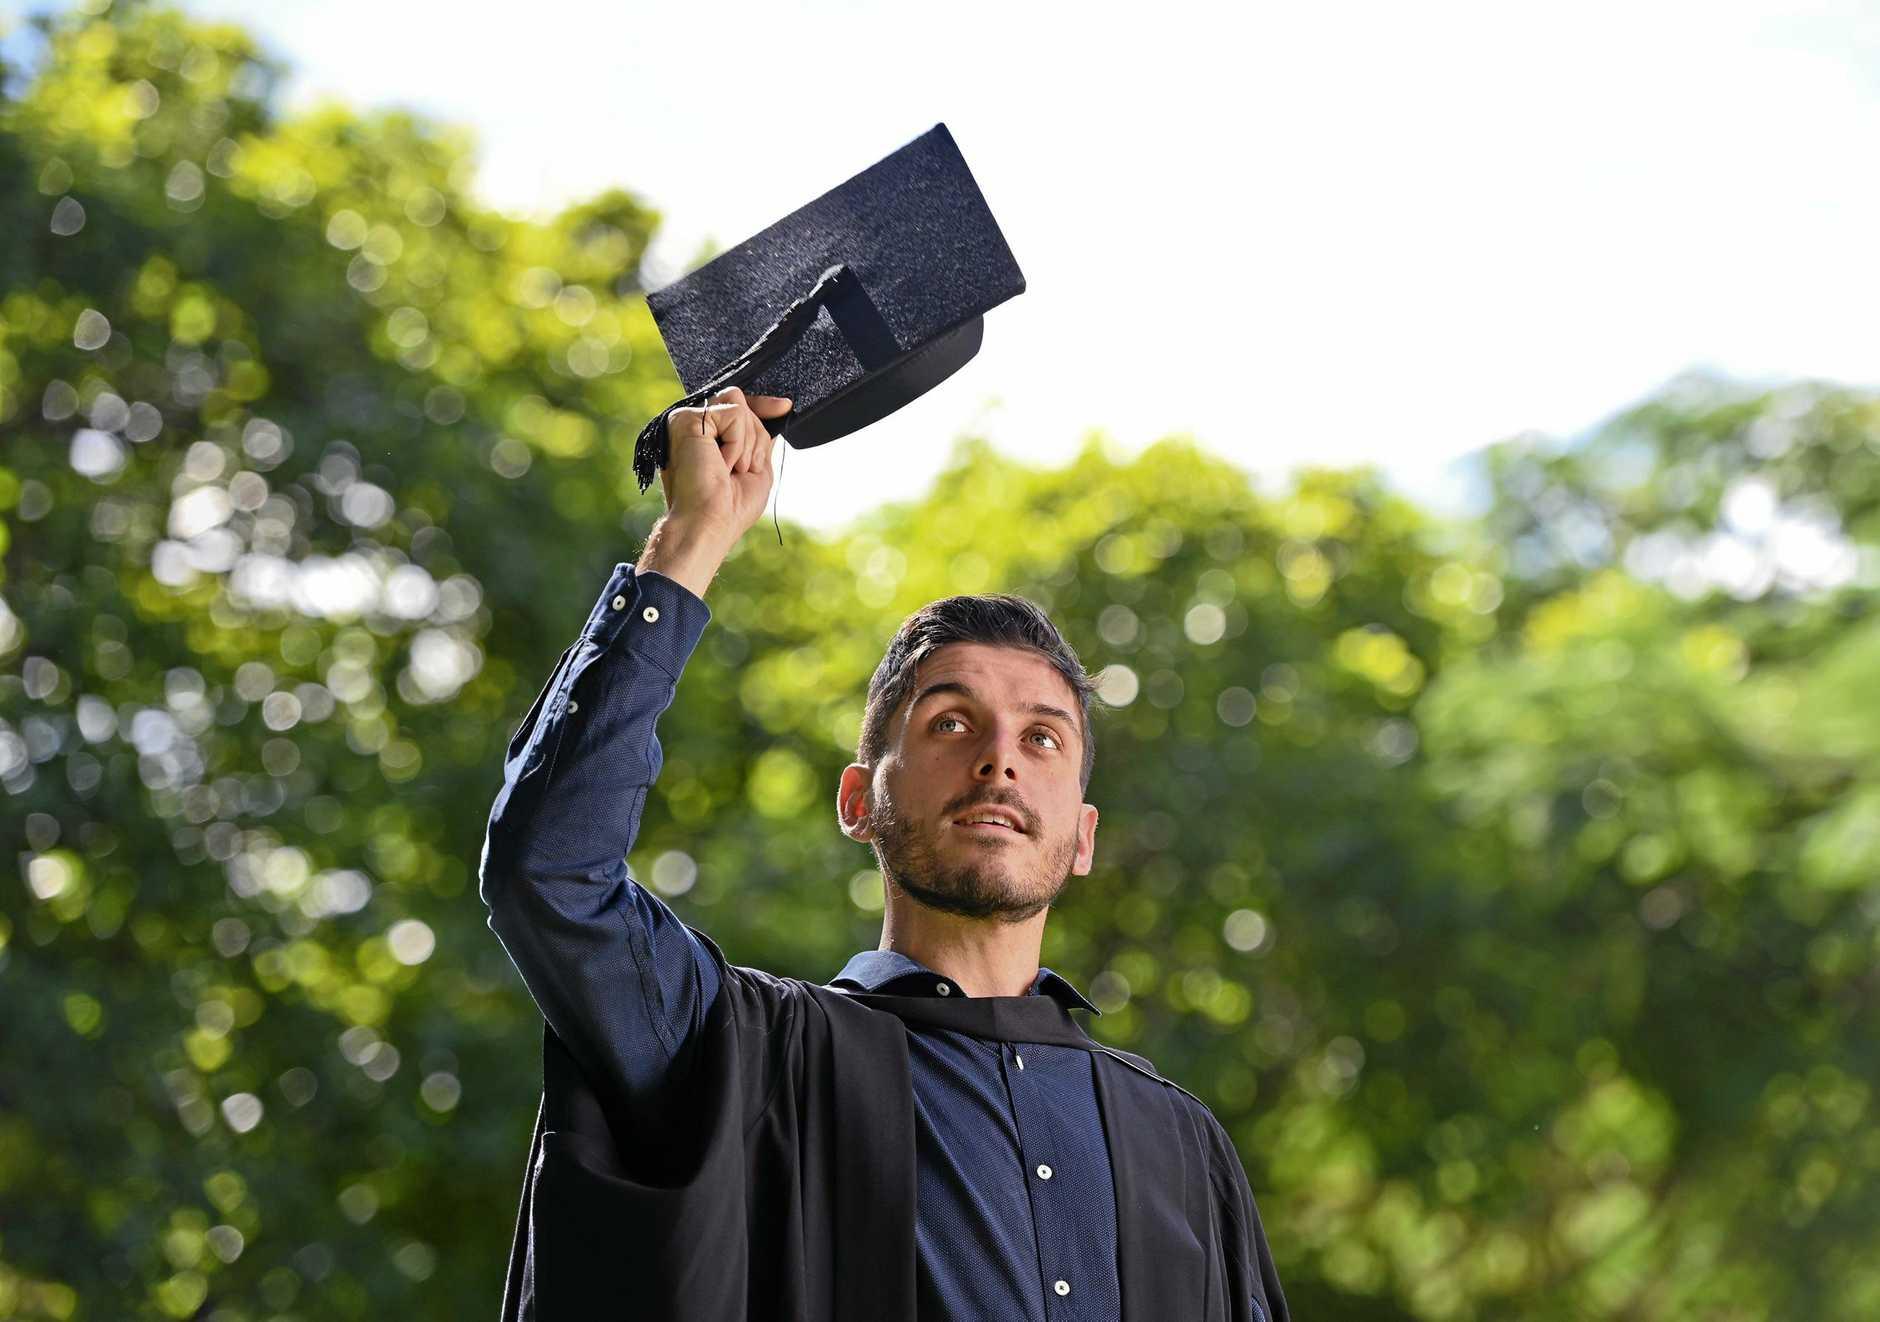 Ivan Reveruzzi graduates with a Bachelor of Education from USQ.